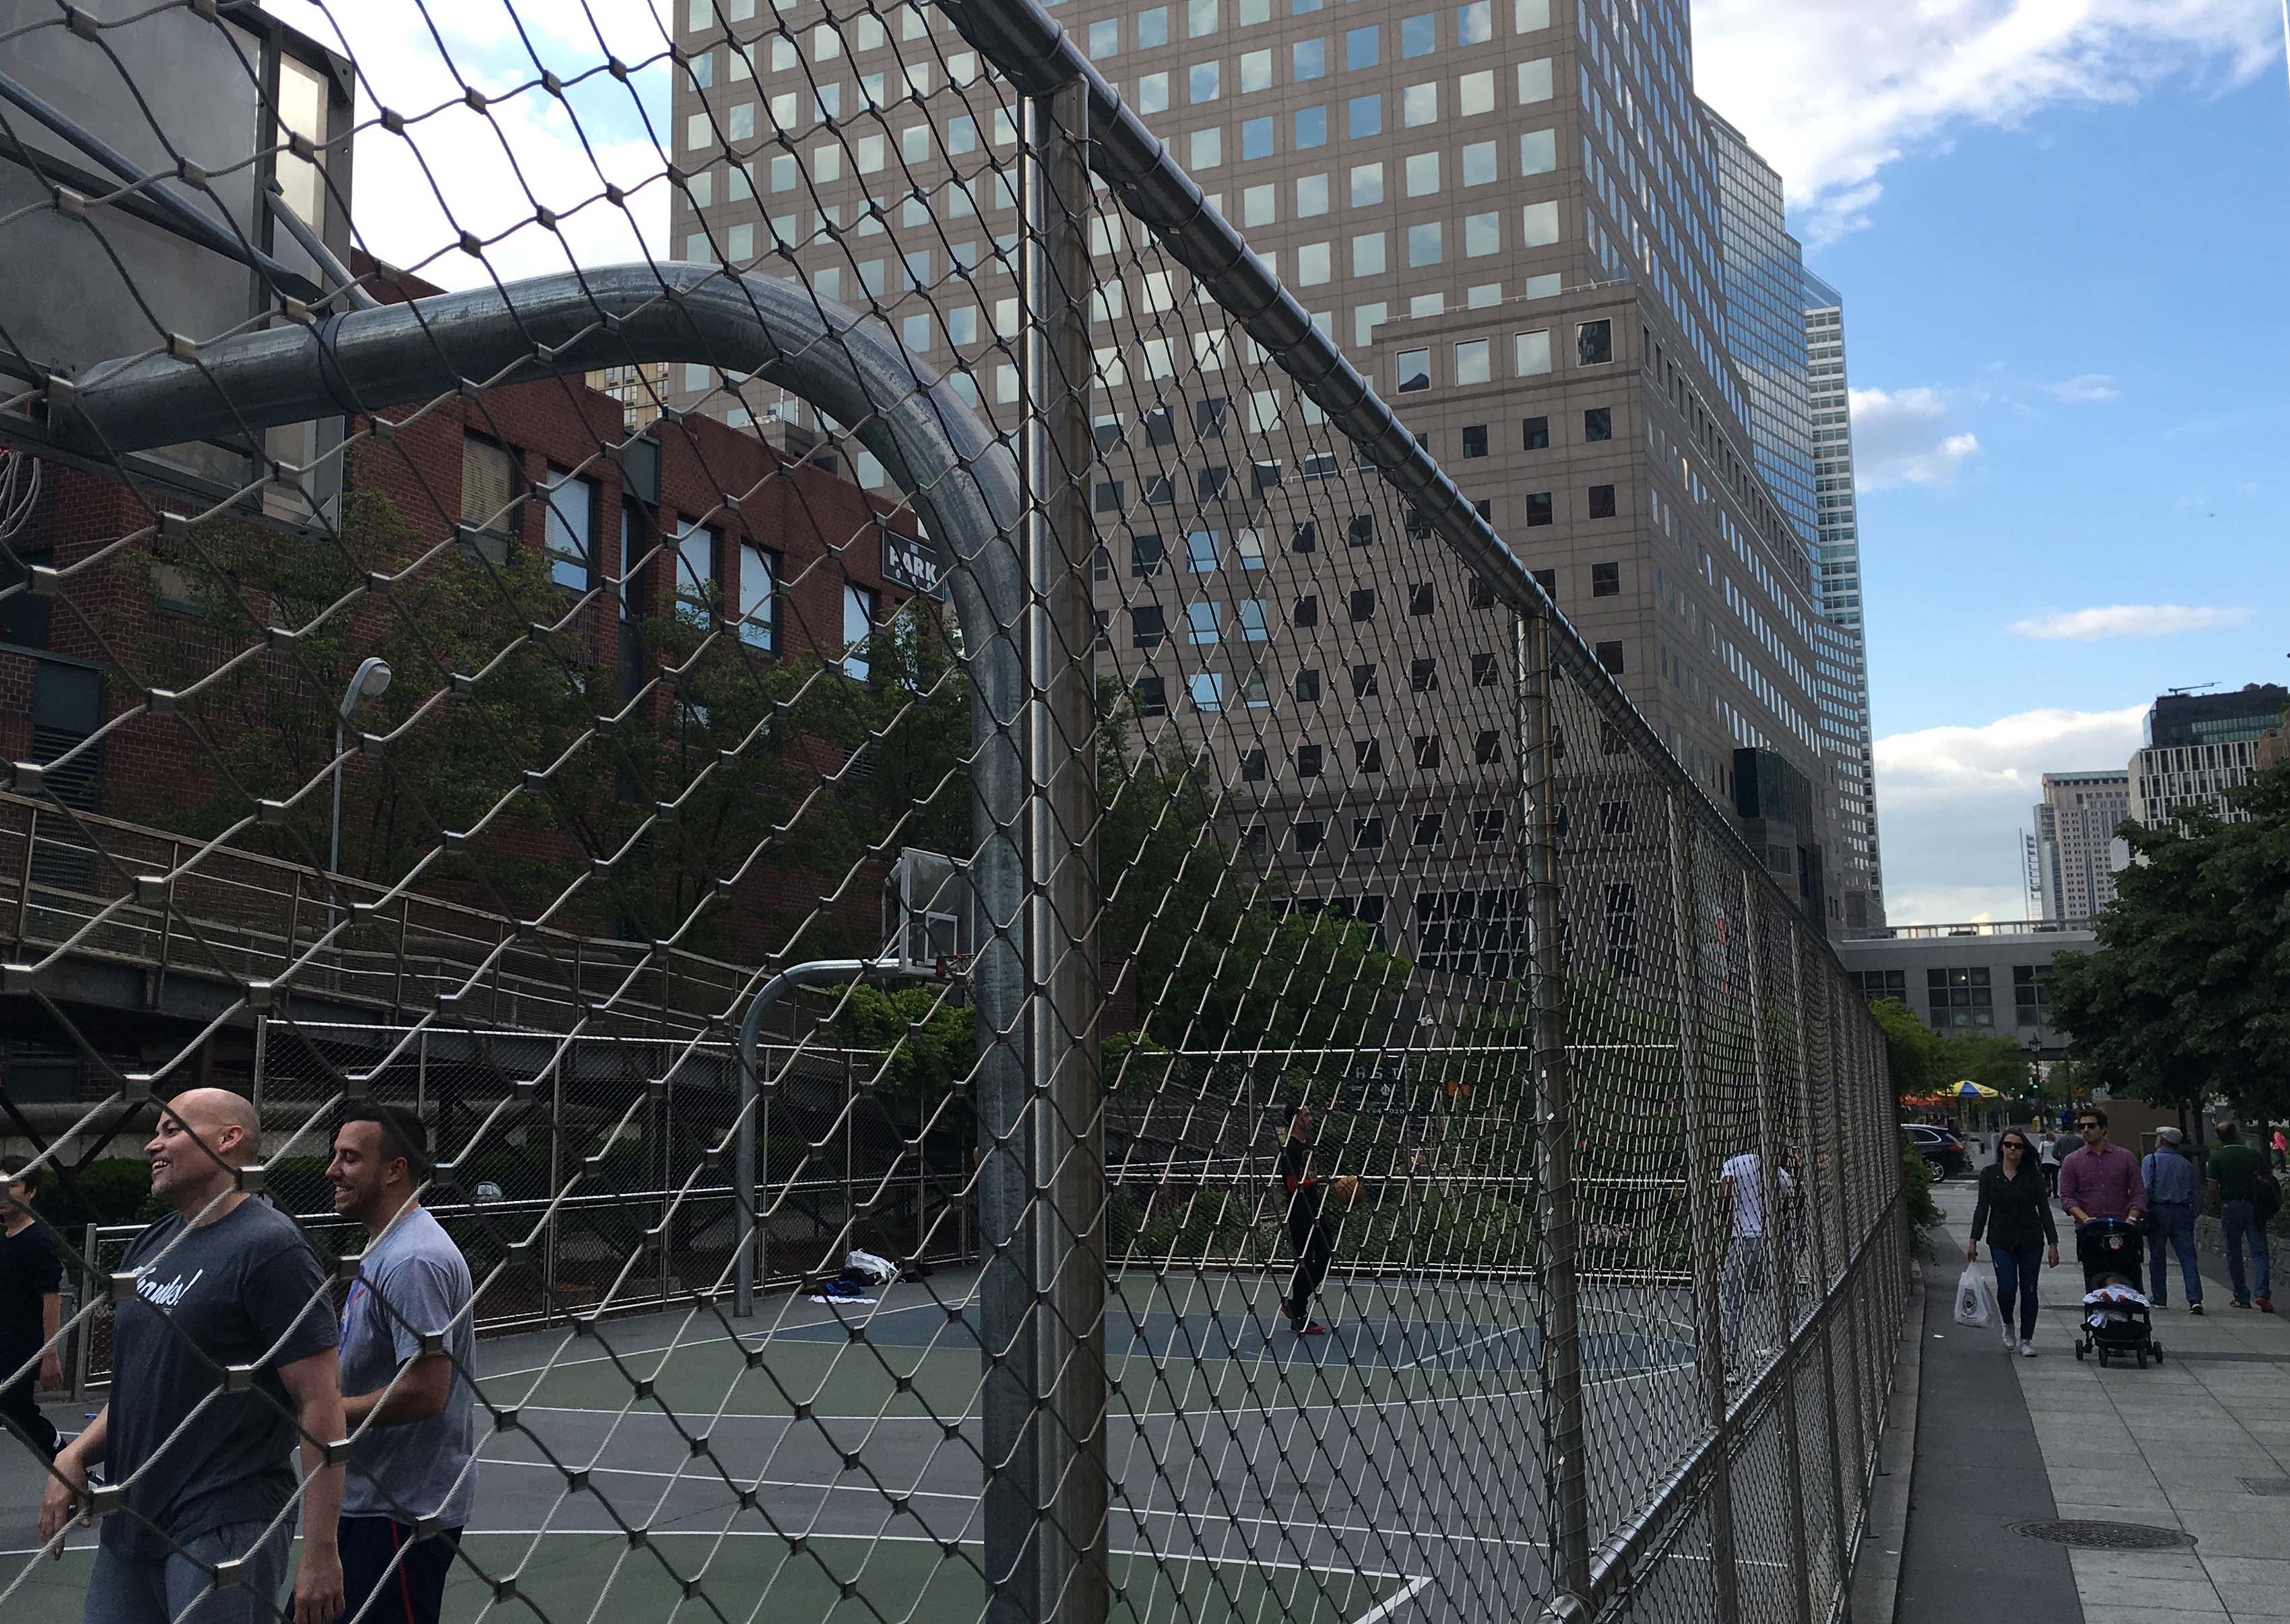 Proper high fence